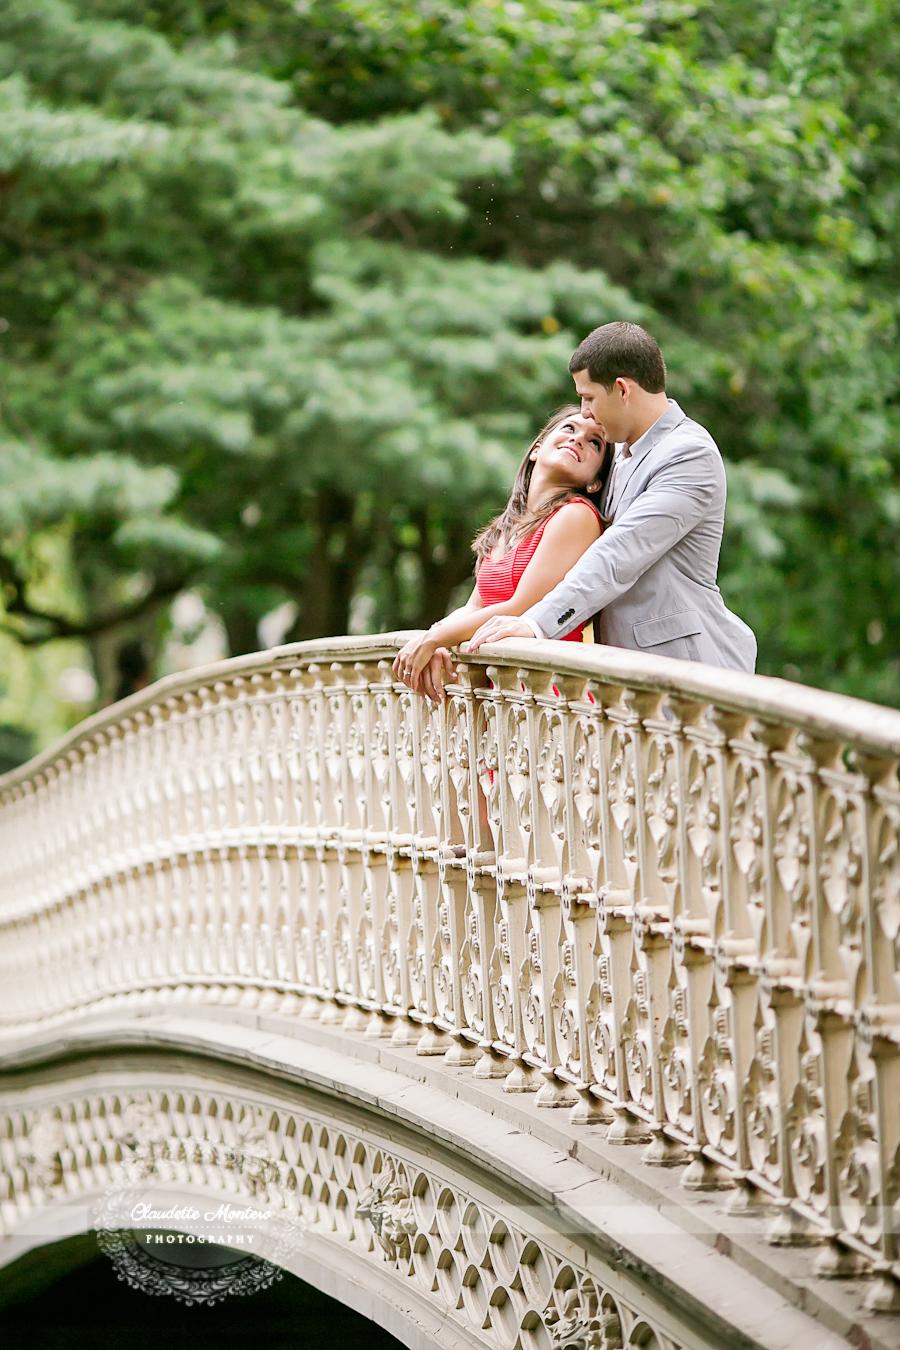 claudette-montero-photography-amaris-emmanuel-new-york-engagement-session-yaska-crespo-wedding-planner-web-logo-0048